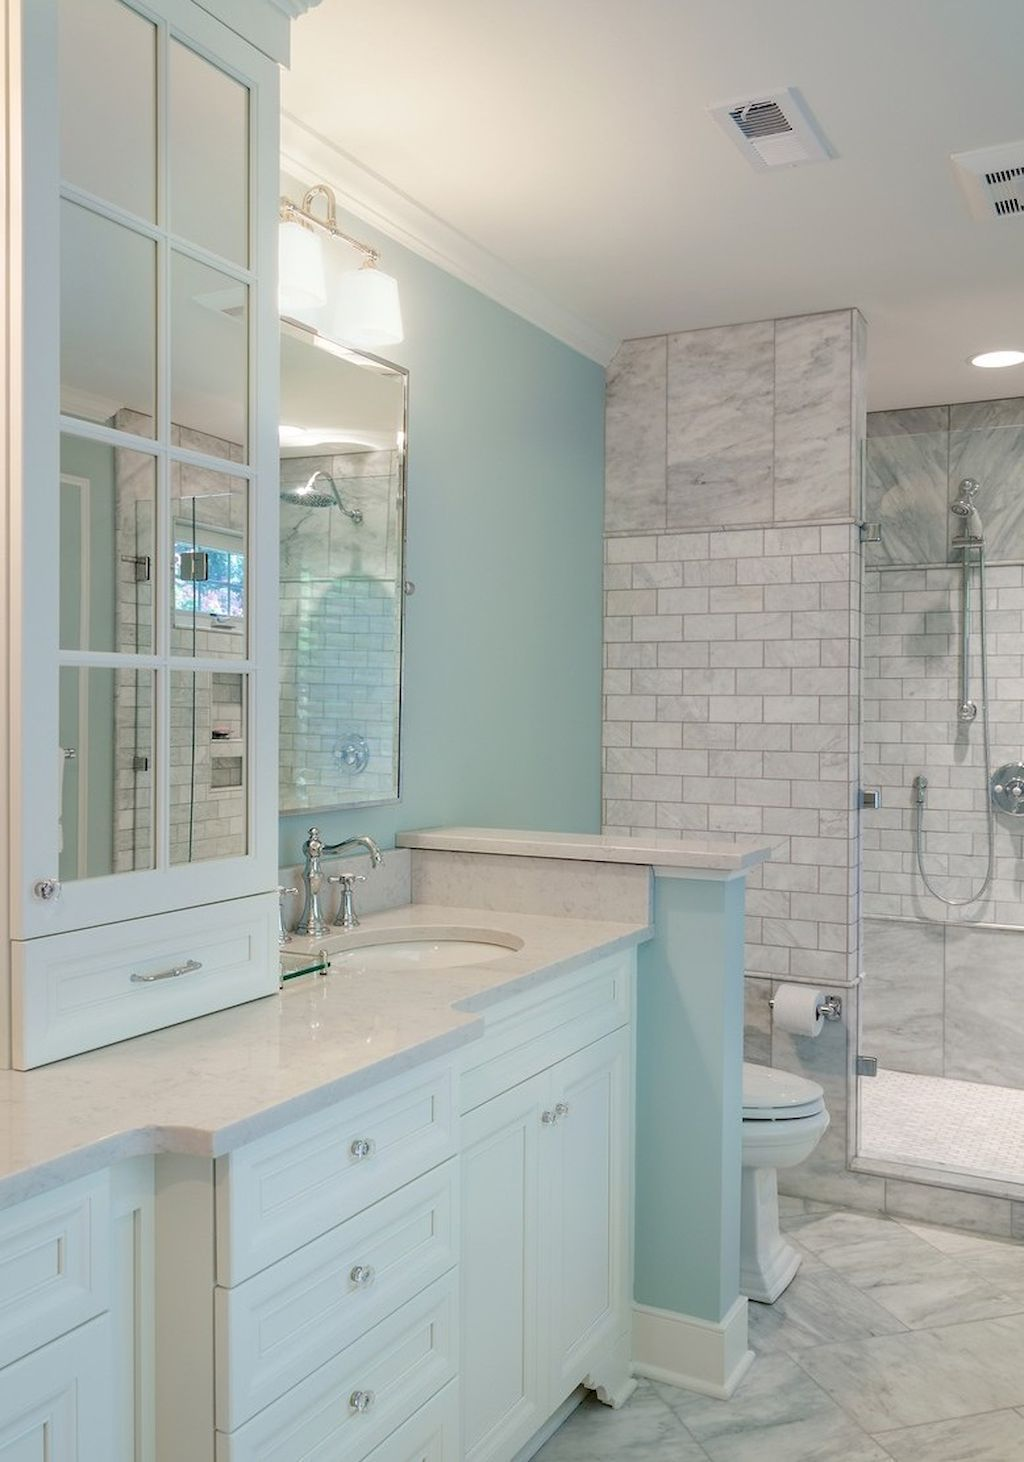 Coastal Beach House Bathroom Remodel Designs (62) | Beach House Bathroom, House Bathroom, Bathroom Remodel Designs